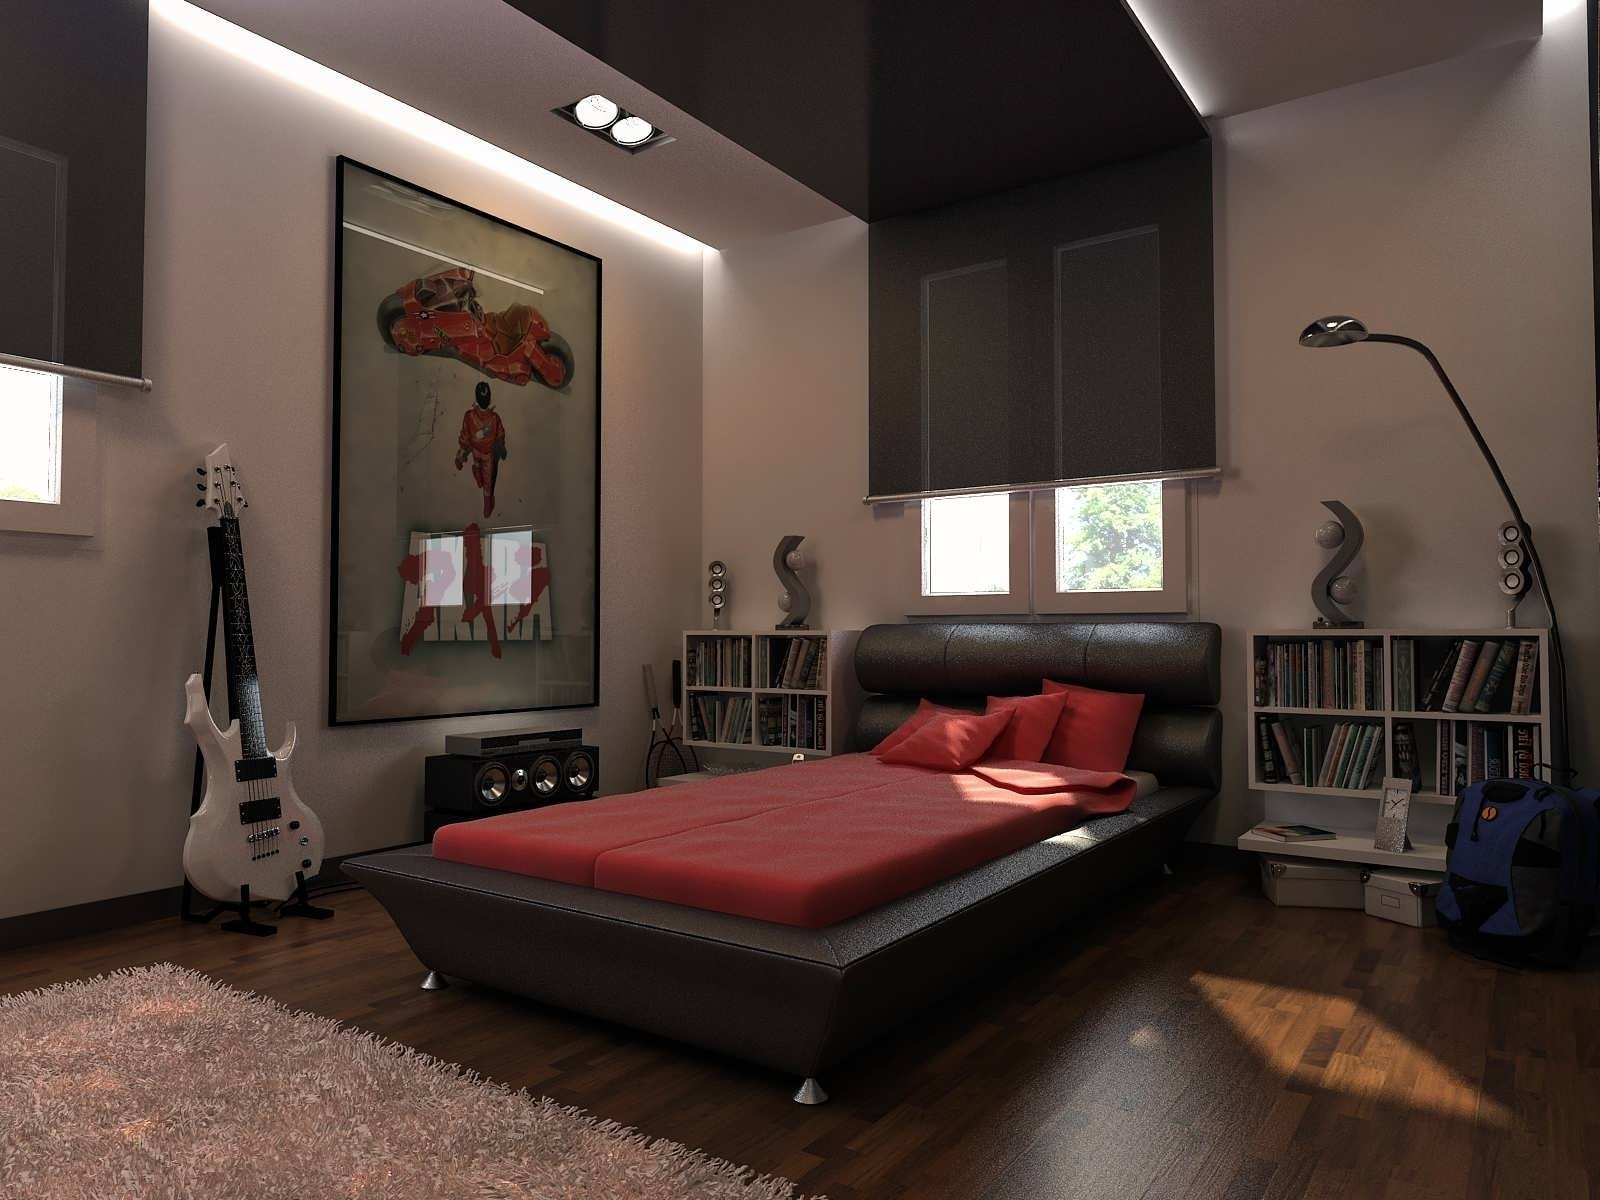 10 Great Room Design Ideas For Guys bedroom design bedroom design cool boy bedrooms fur ideas guys 2020